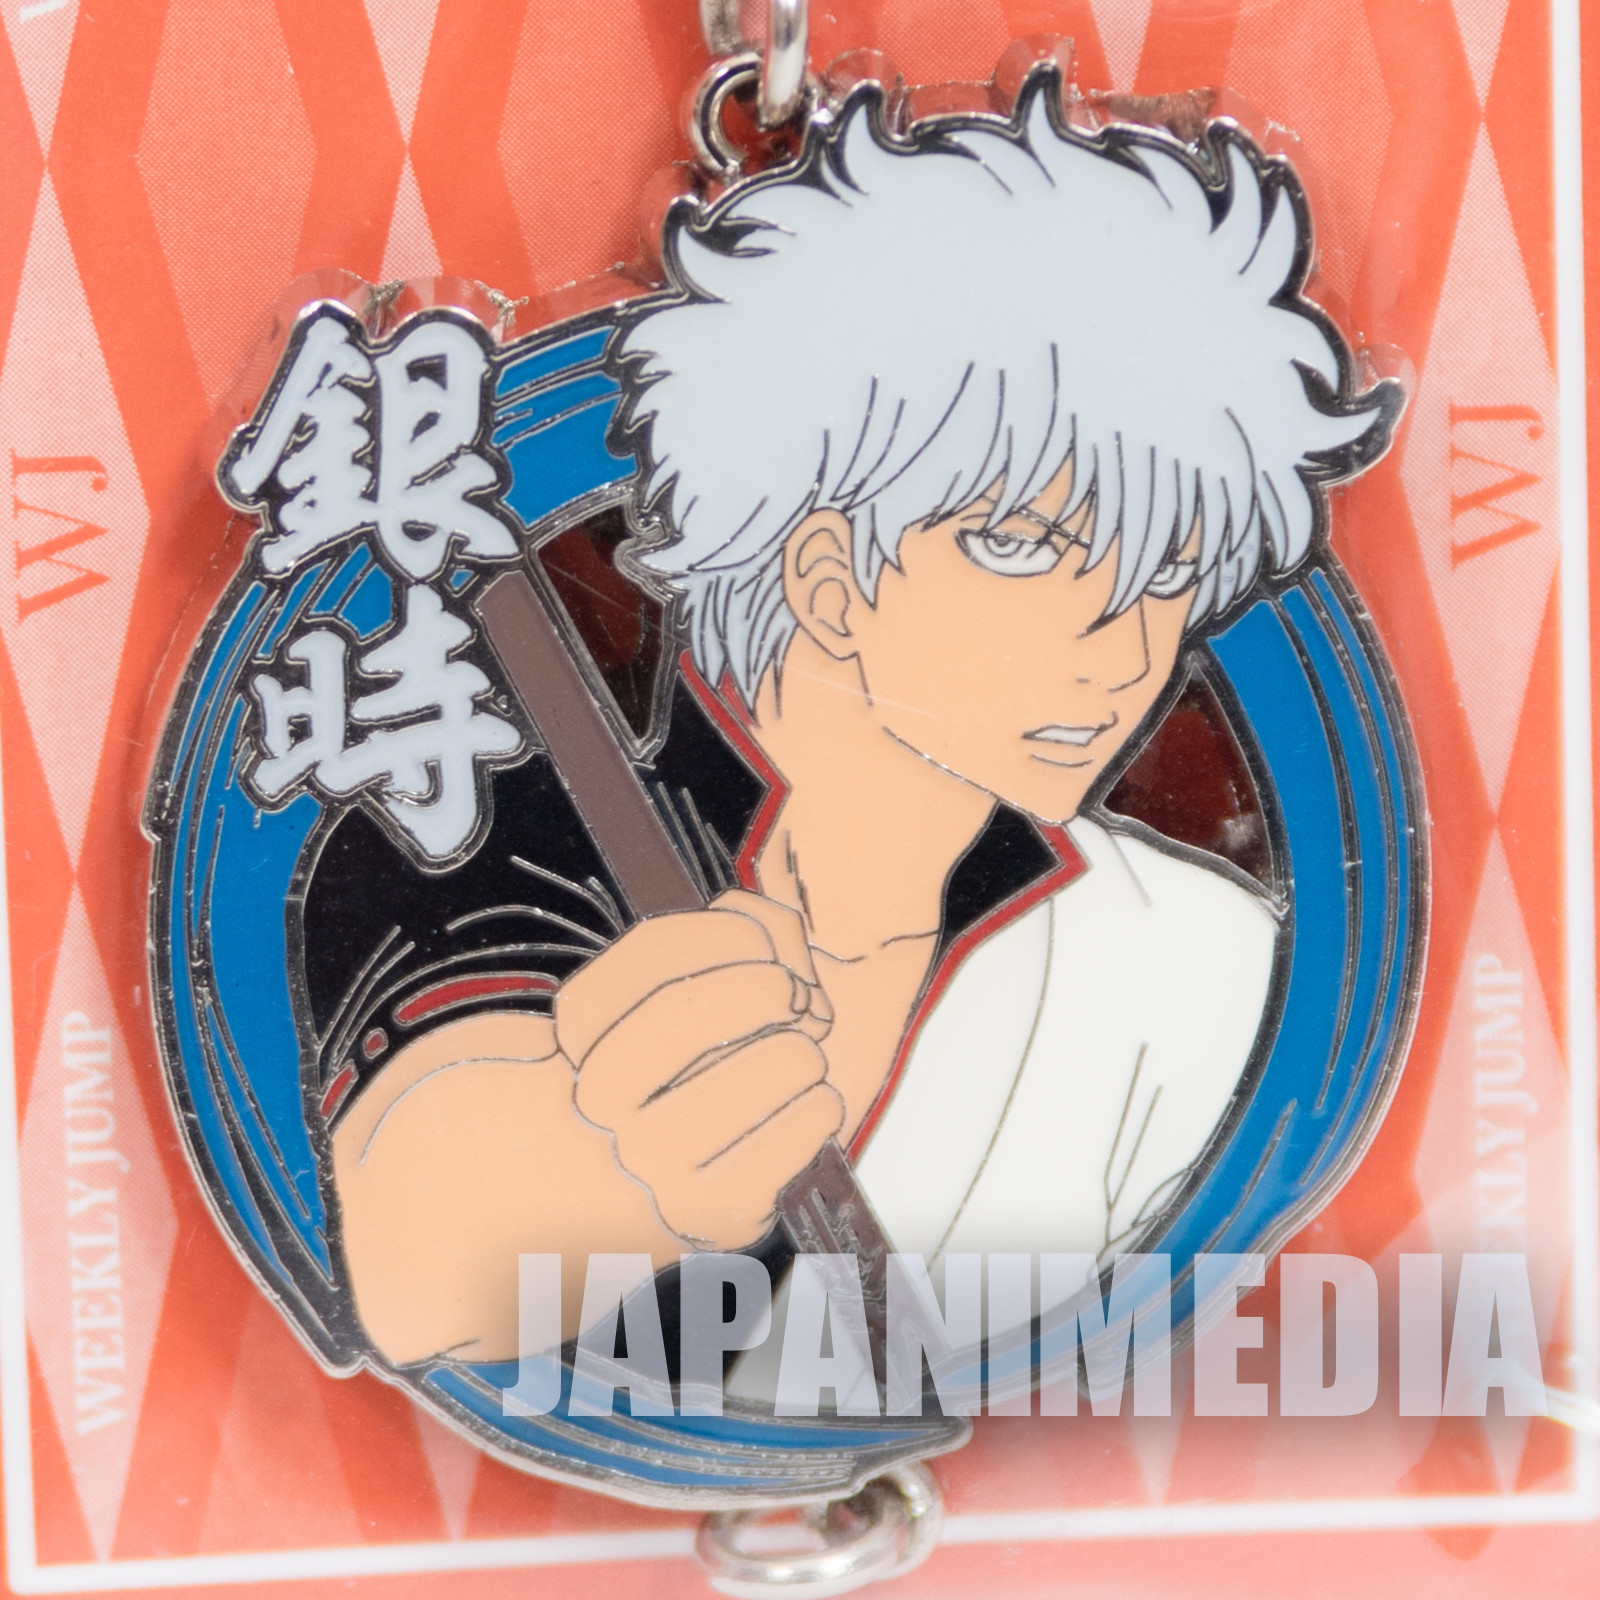 Gintama Gintama Sakata Metal Charm Collection Weekly Jump Character JAPAN ANIME